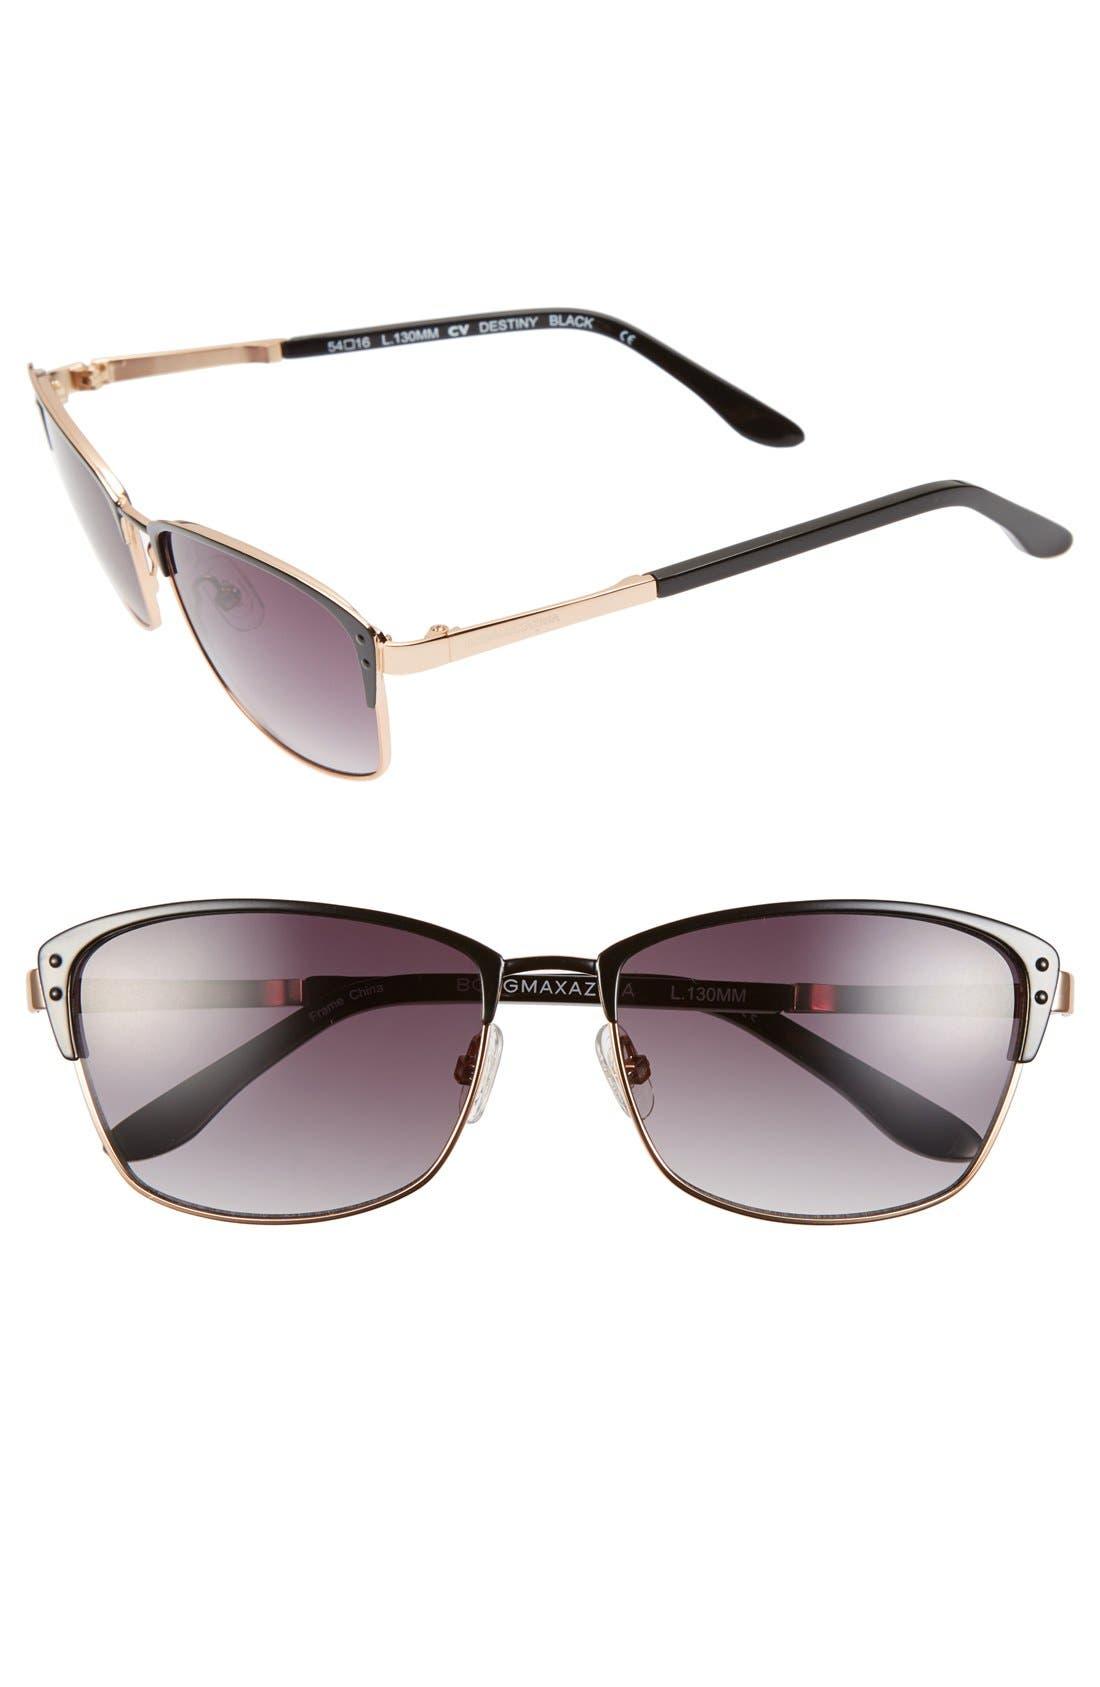 Alternate Image 1 Selected - BCBGMAXAZRIA 'Destiny' 54mm Sunglasses